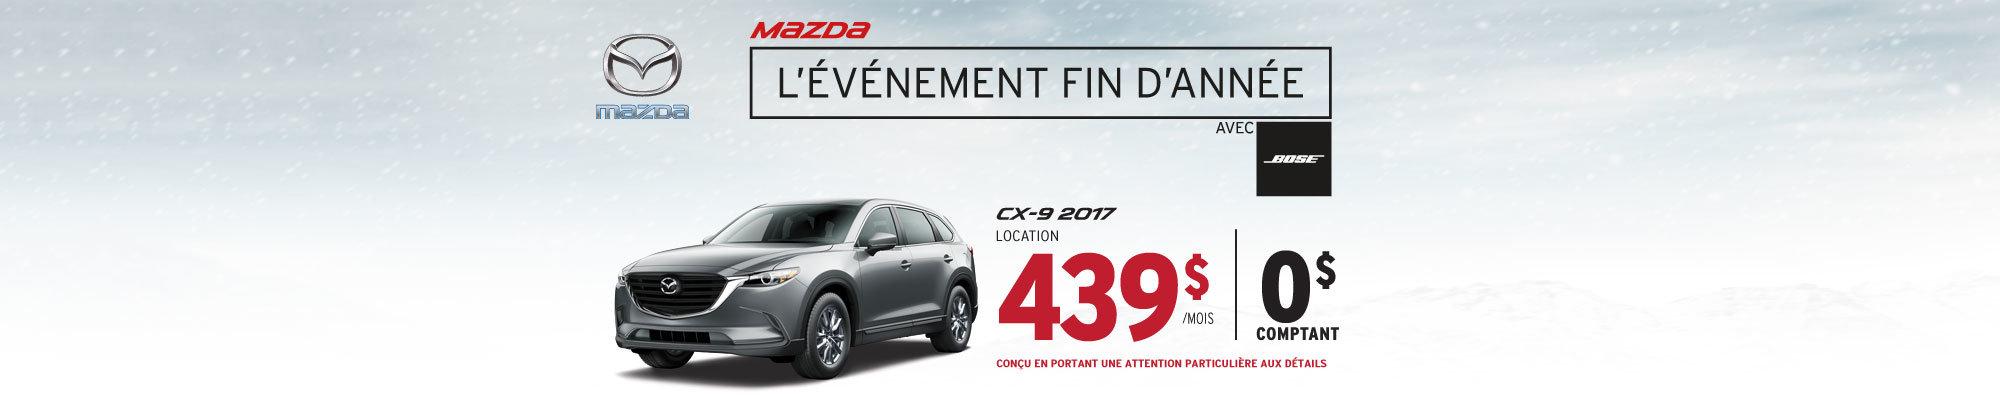 Mazda CX-9 2017 web